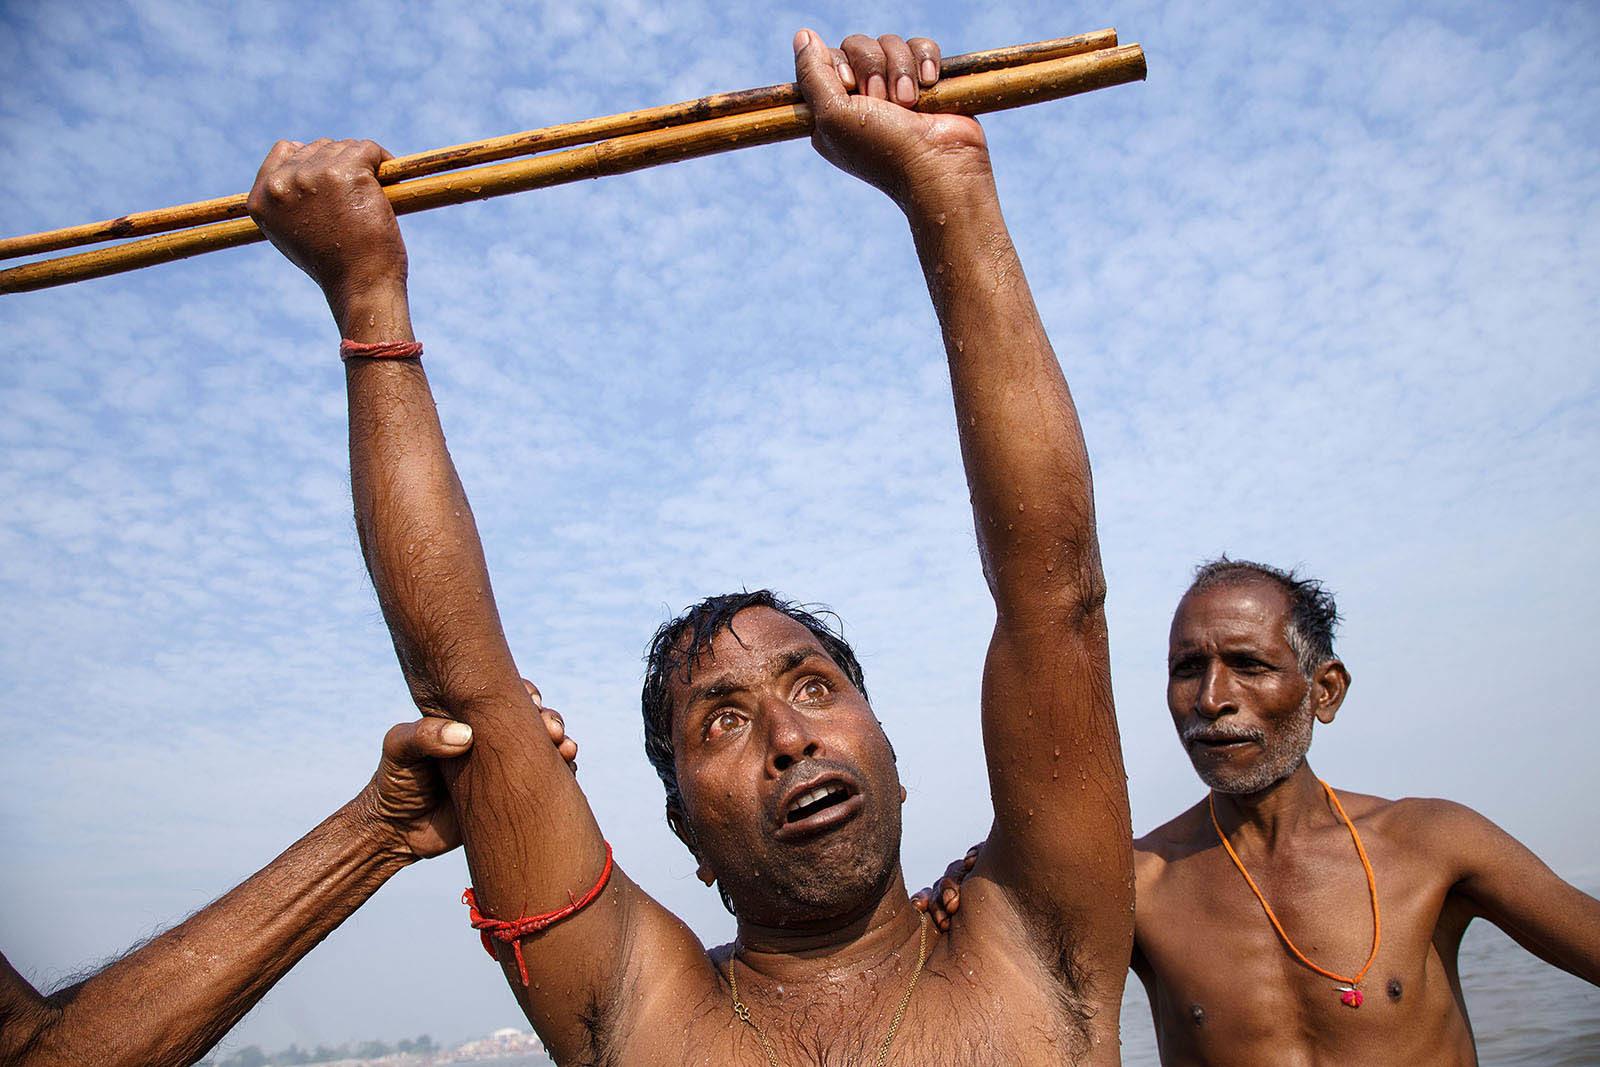 india_bihar_sonepur_mela_tantriks_ritual_religion_hindu-1600x1067.jpg